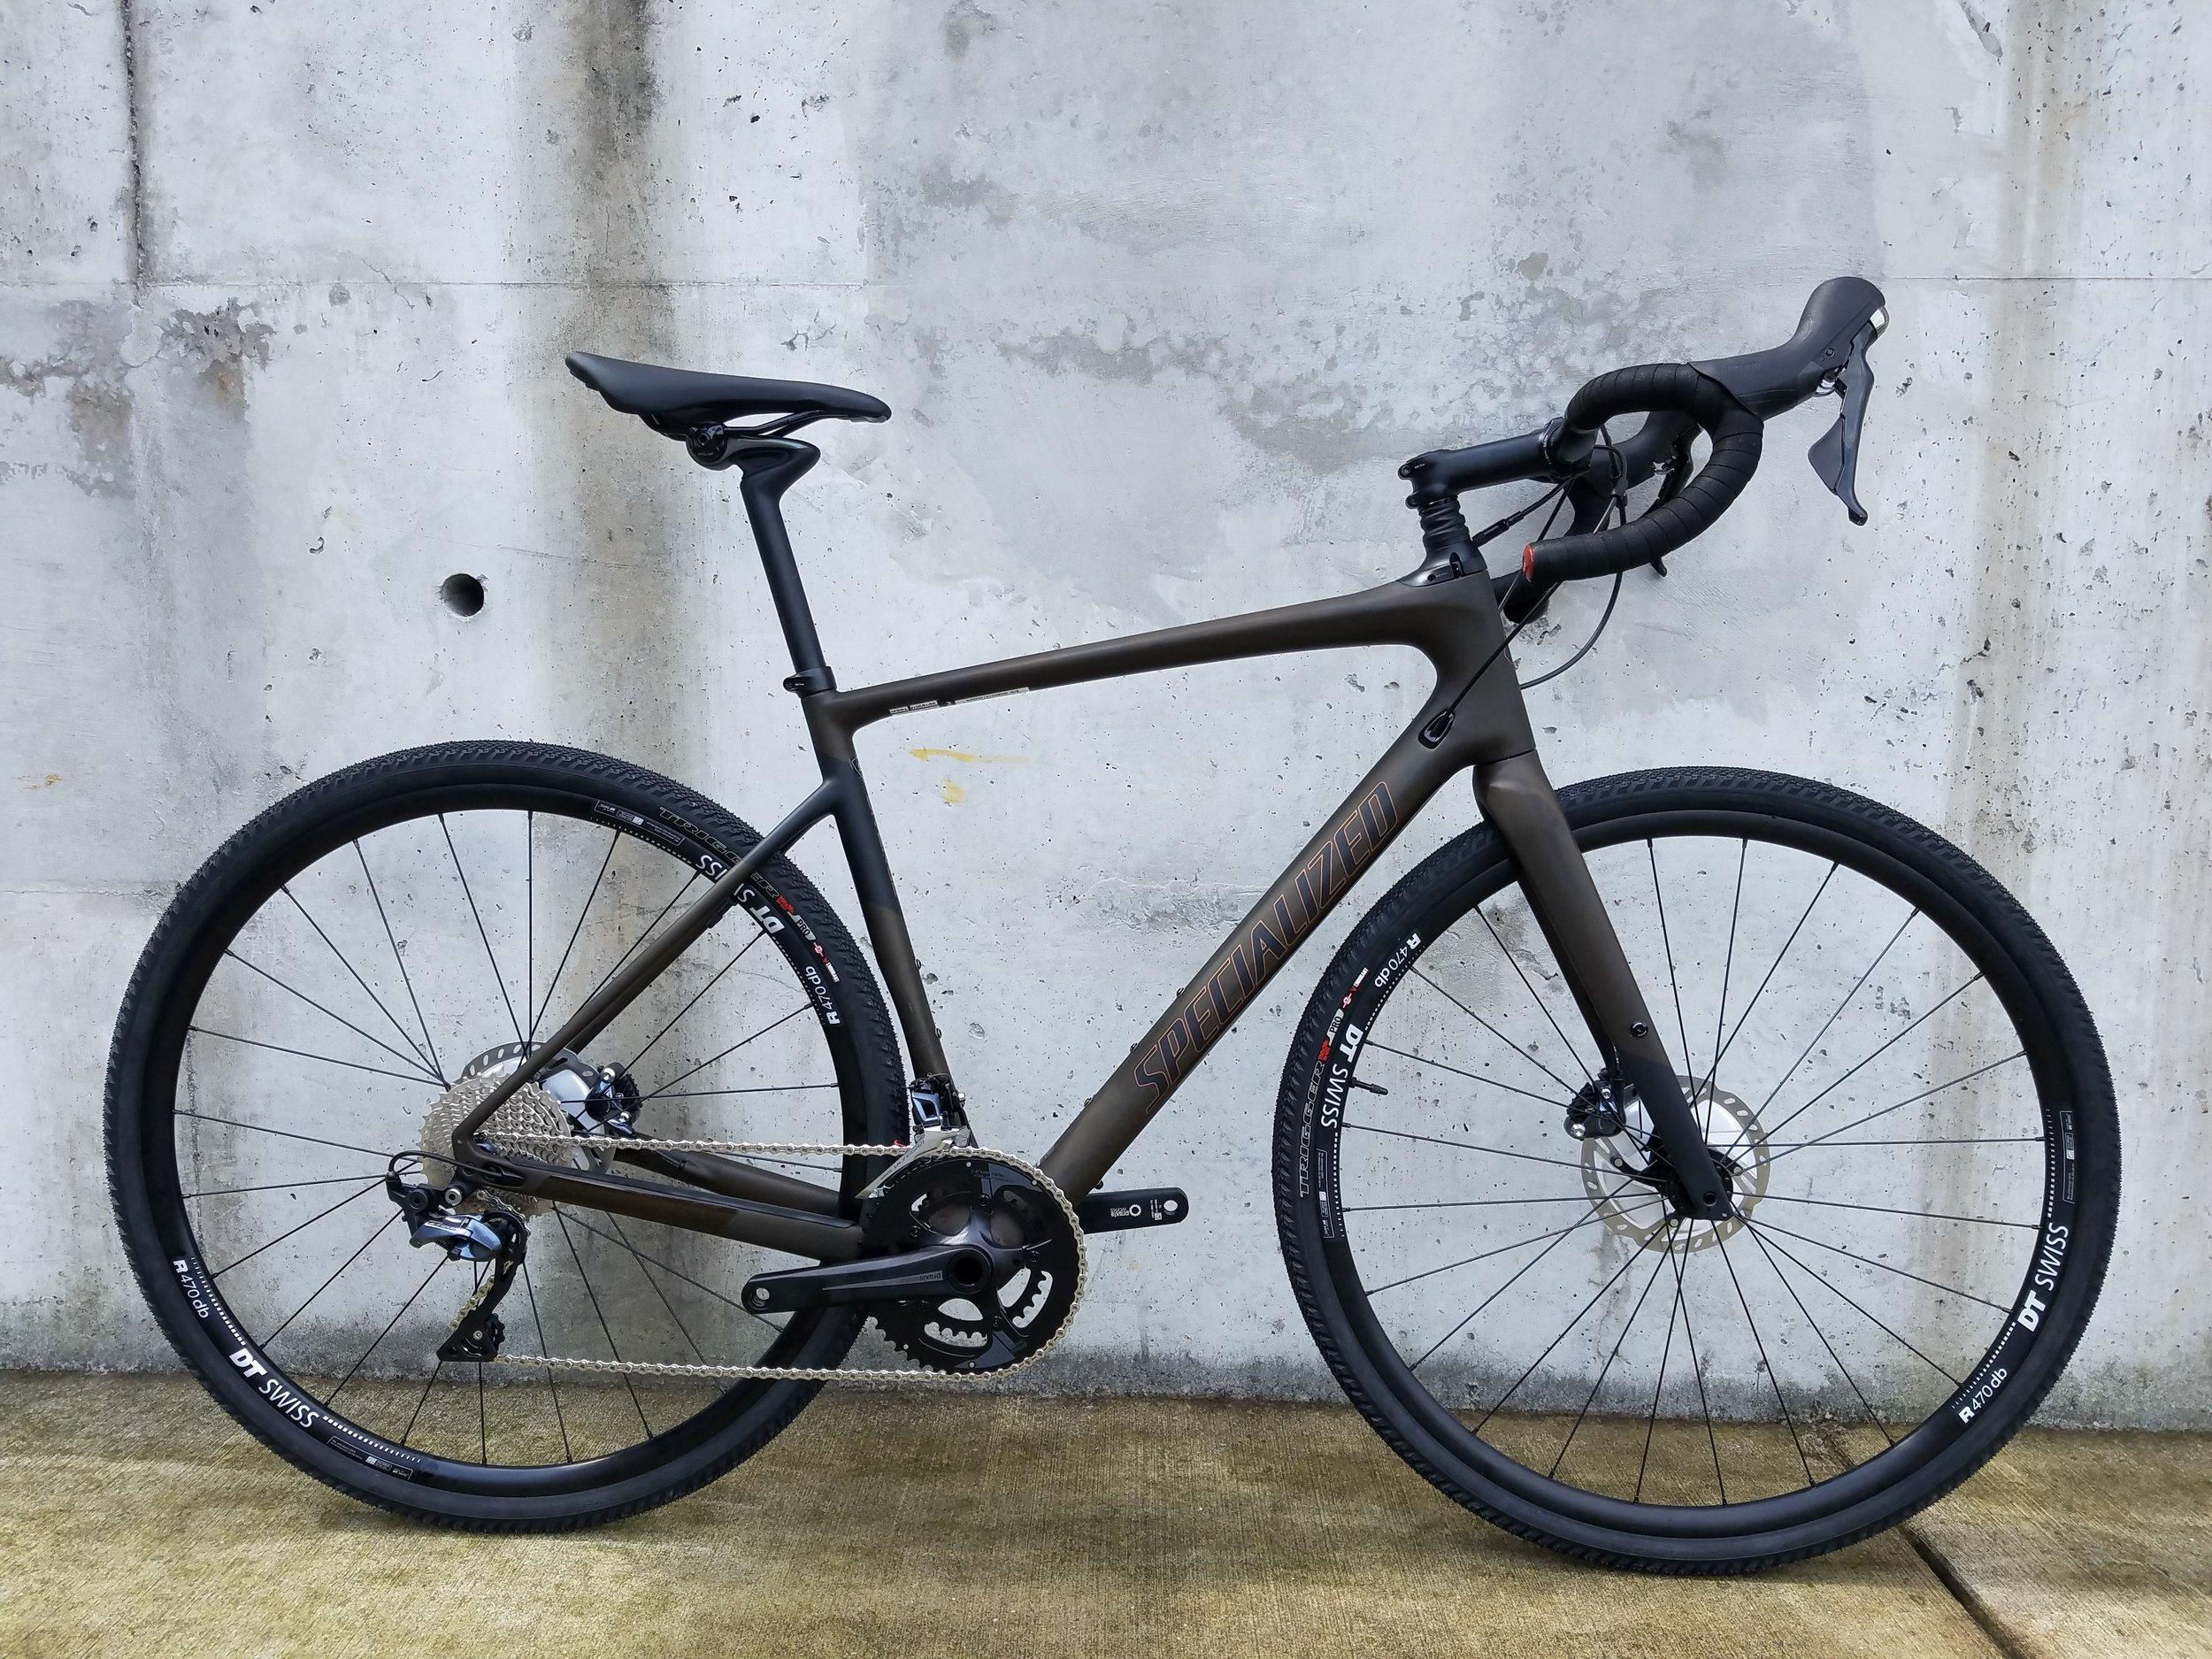 Bike pictured size: 56cm